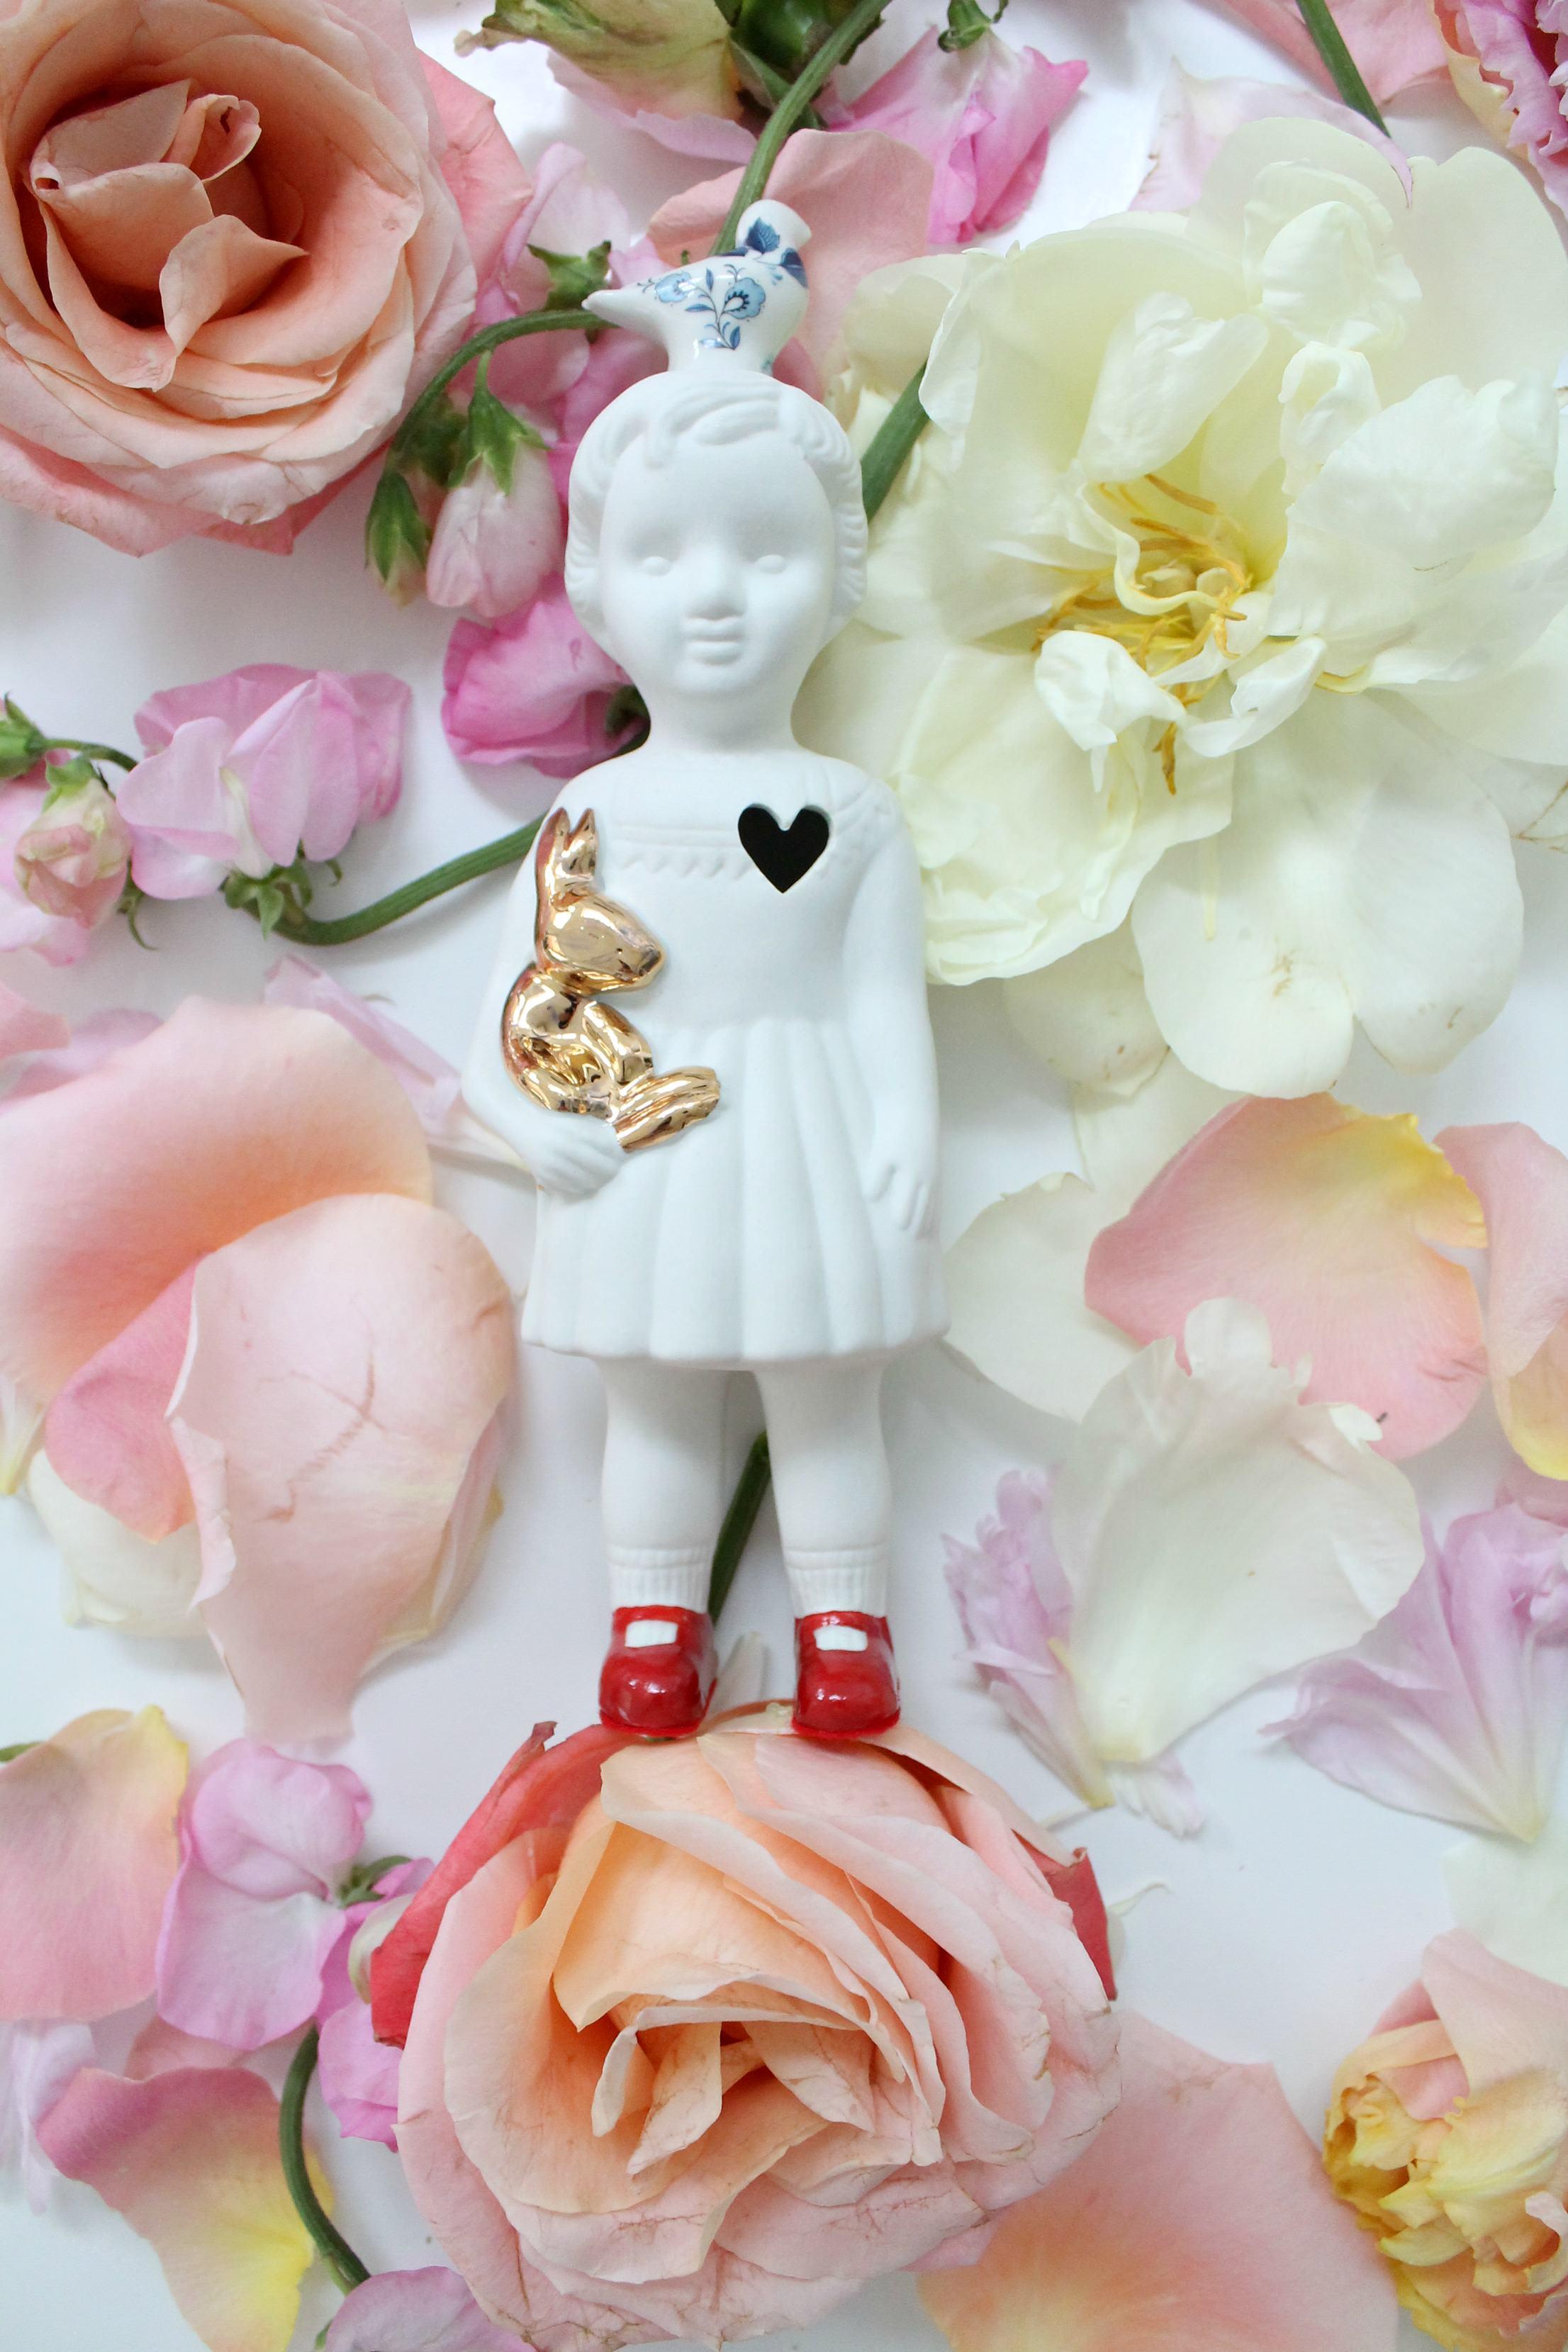 Clonette-doll-floral -Little-Big-Bell